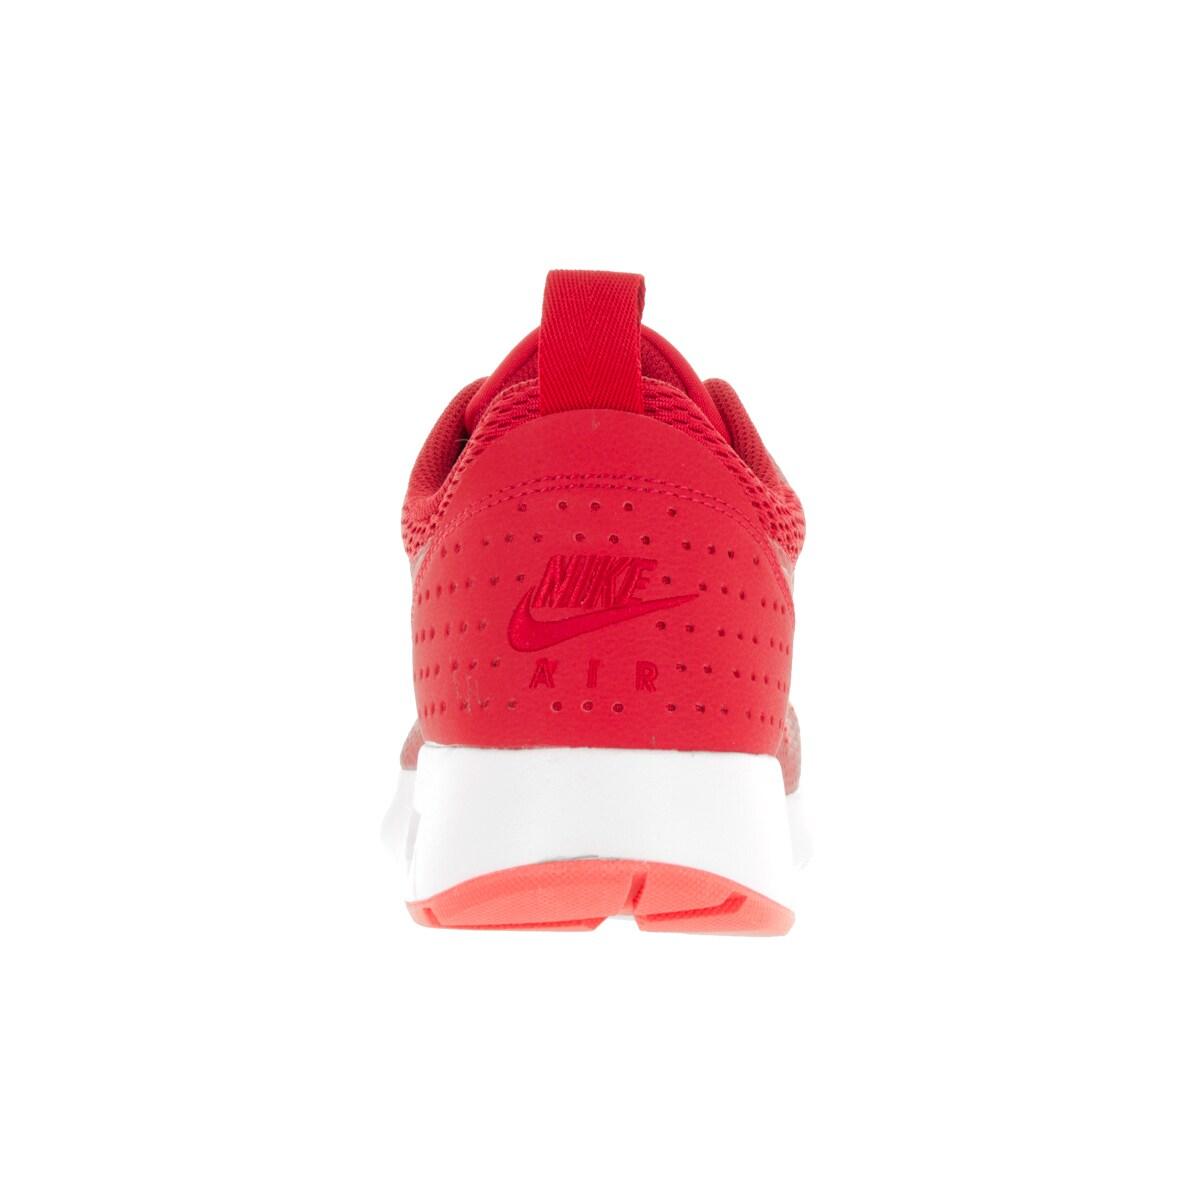 watch 62647 86db6 Shop Nike Men s Air Max Tavas University Red Lt Crimson Wht Running Shoe -  Free Shipping Today - Overstock - 13395030